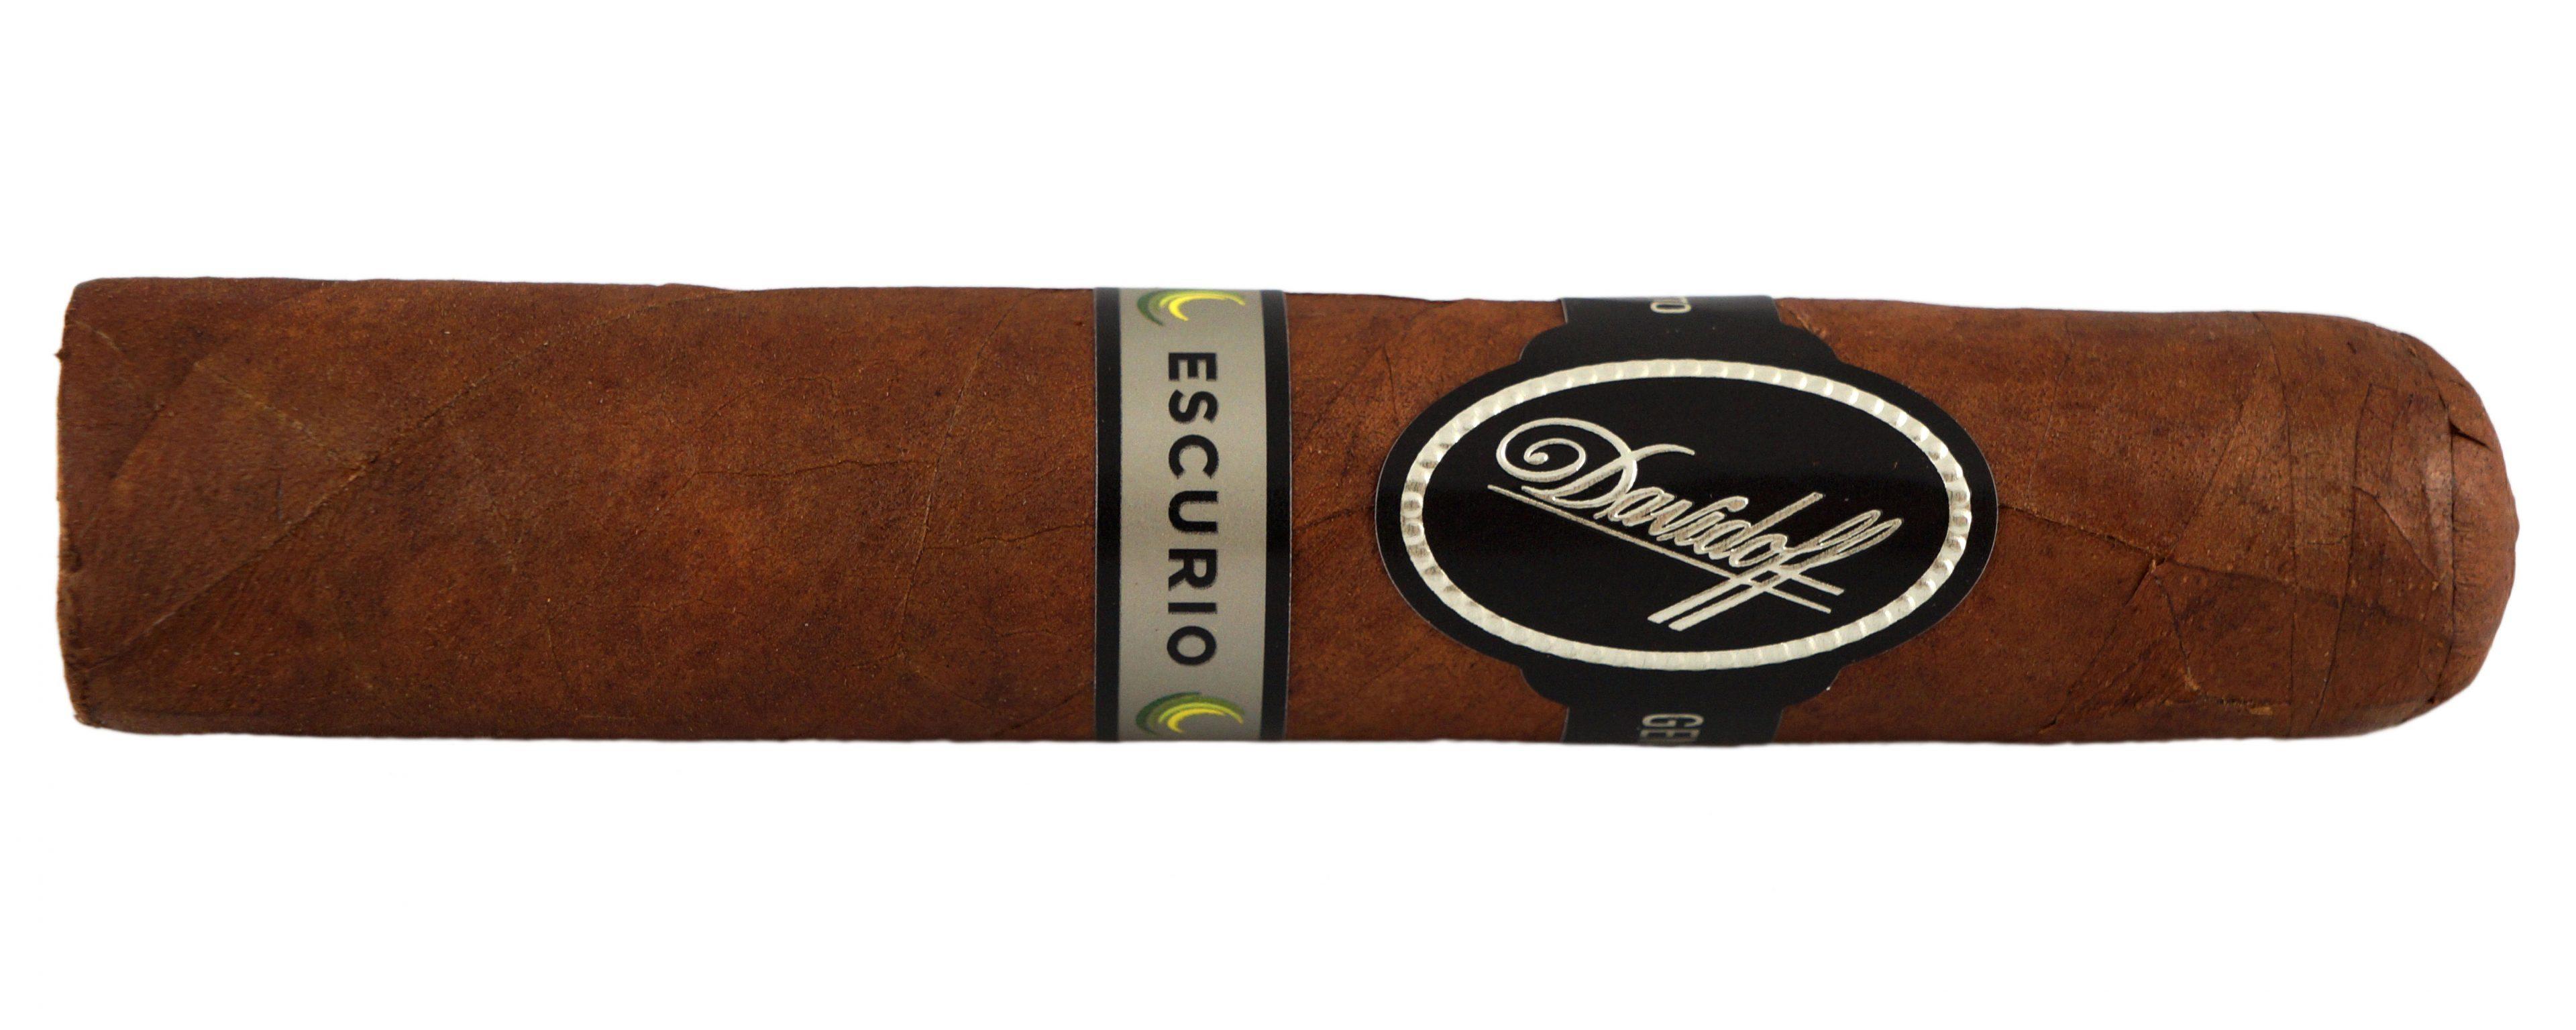 Blind Cigar Review: Davidoff | Escurio Robusto